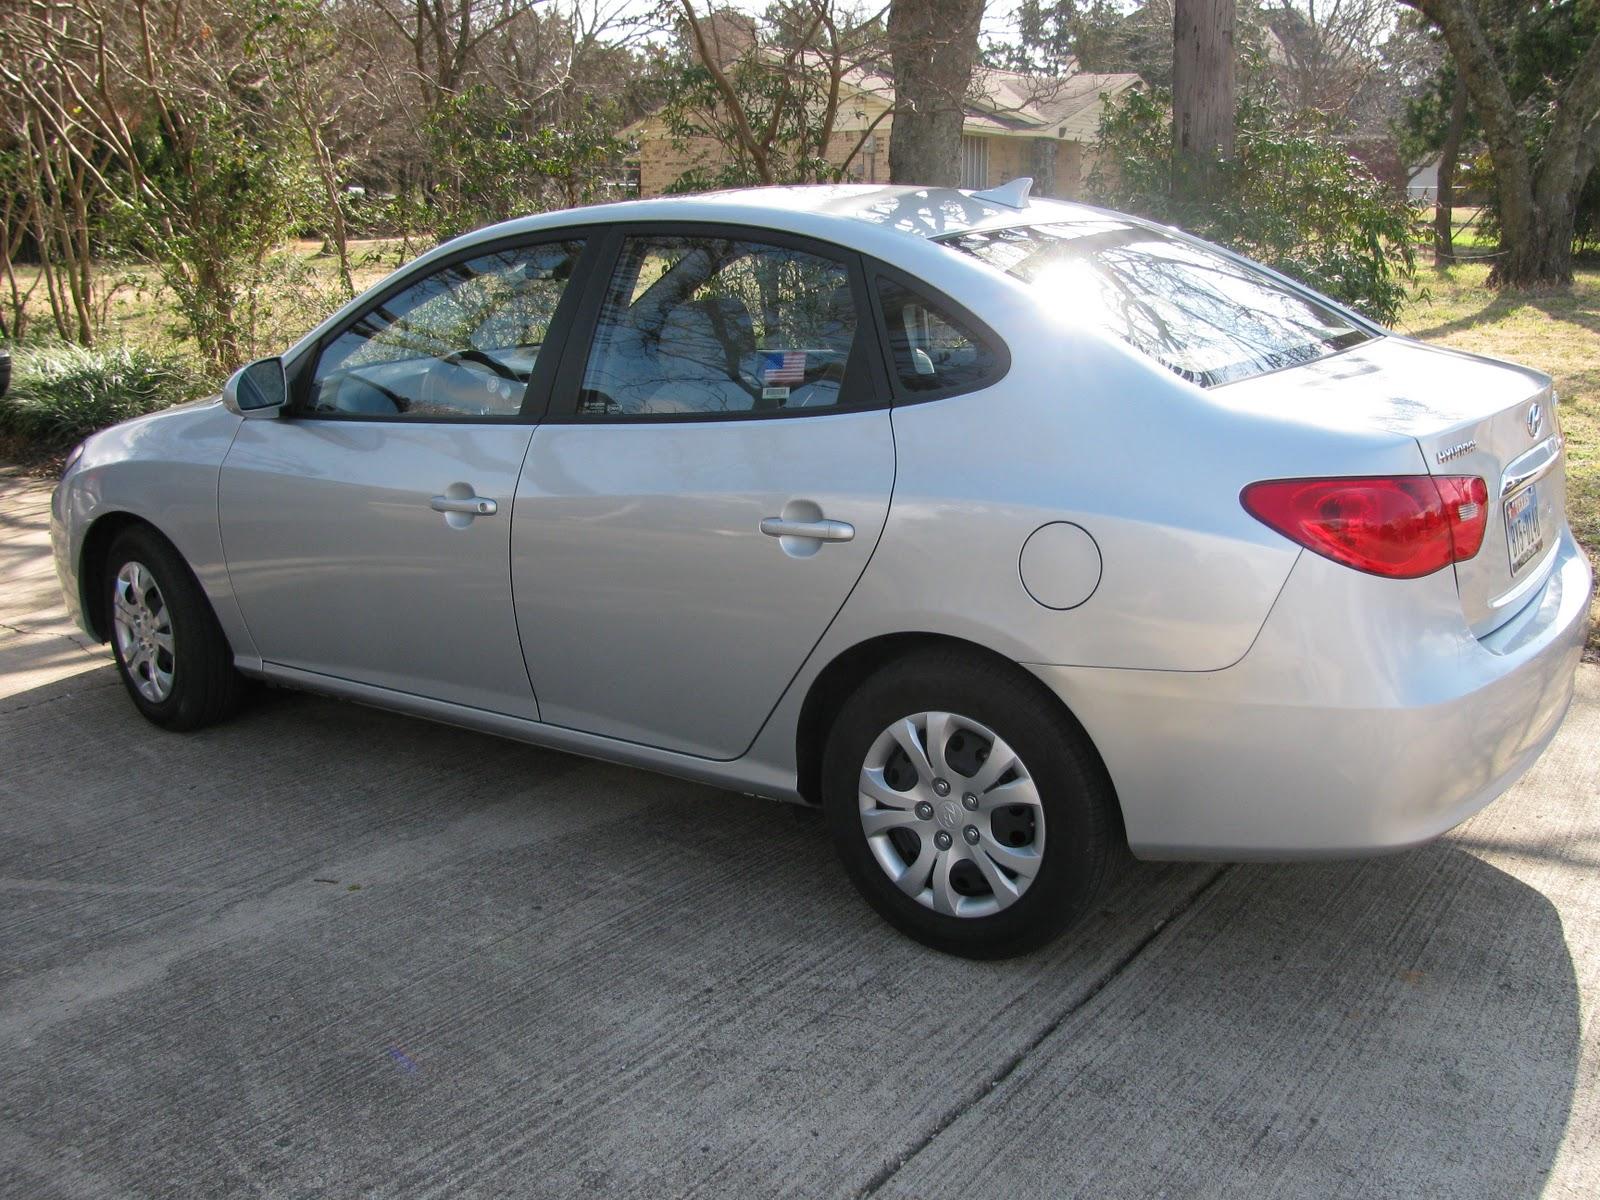 2010 hyundai elantra gls - 2010 Hyundai Elantra 19 Hyundai Elantra 19